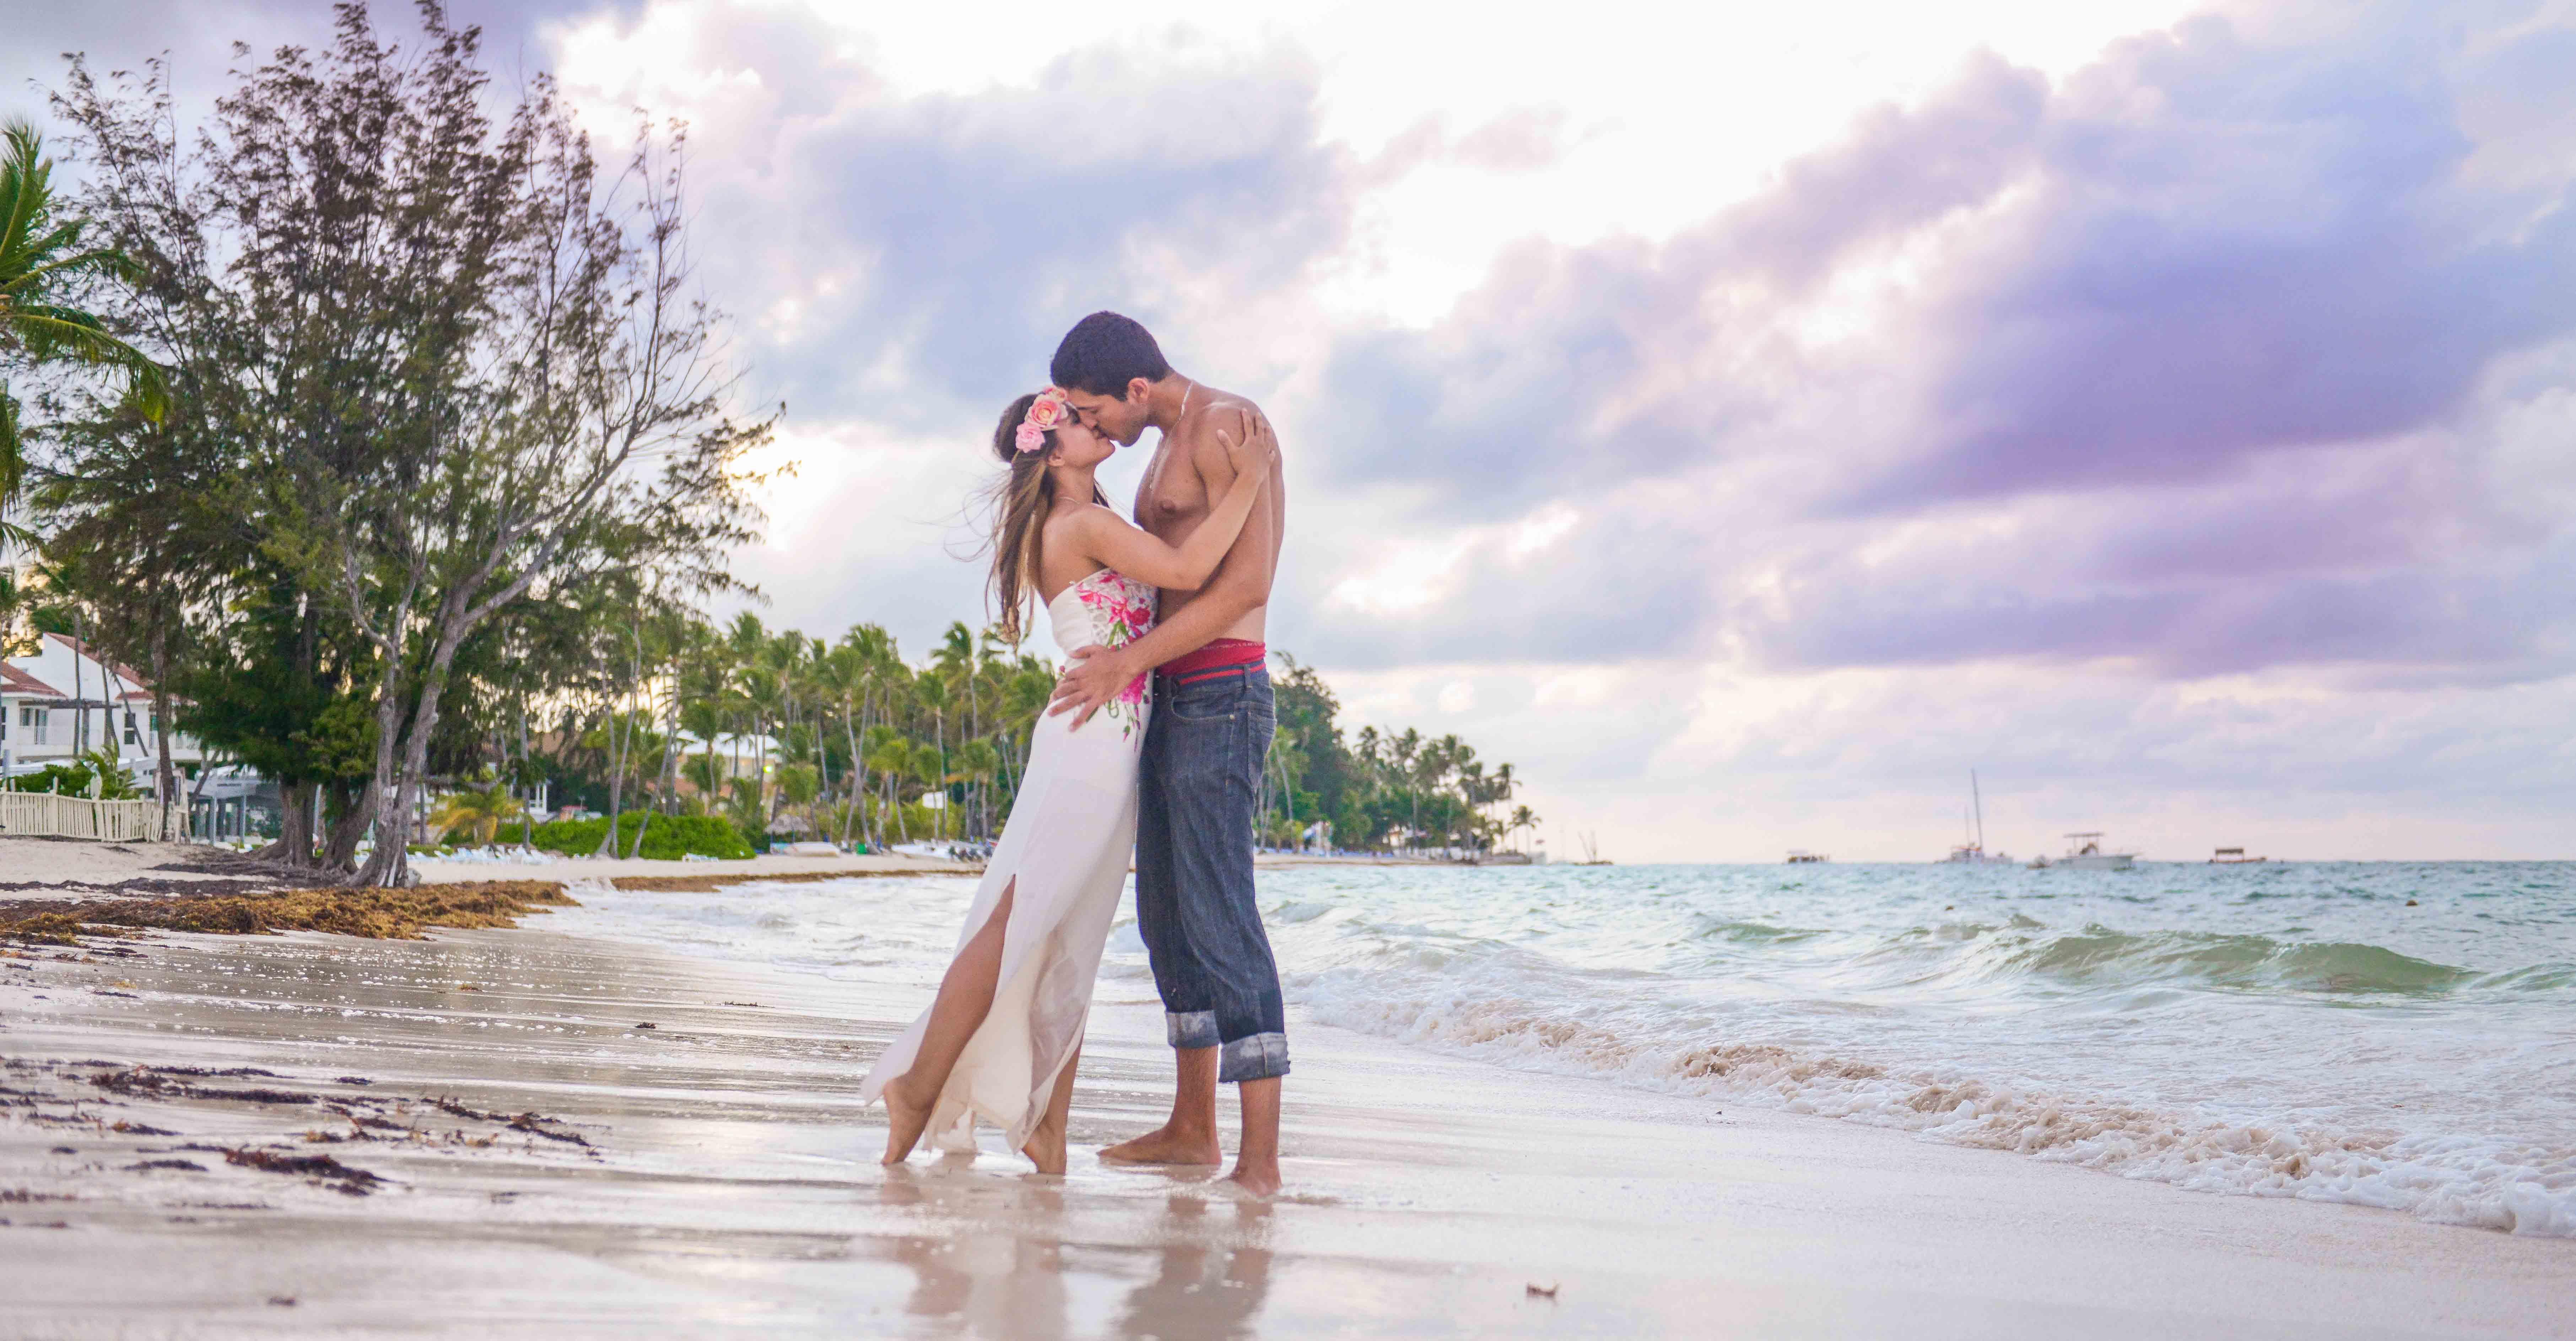 Sesion de fotos de boda en Punta Can